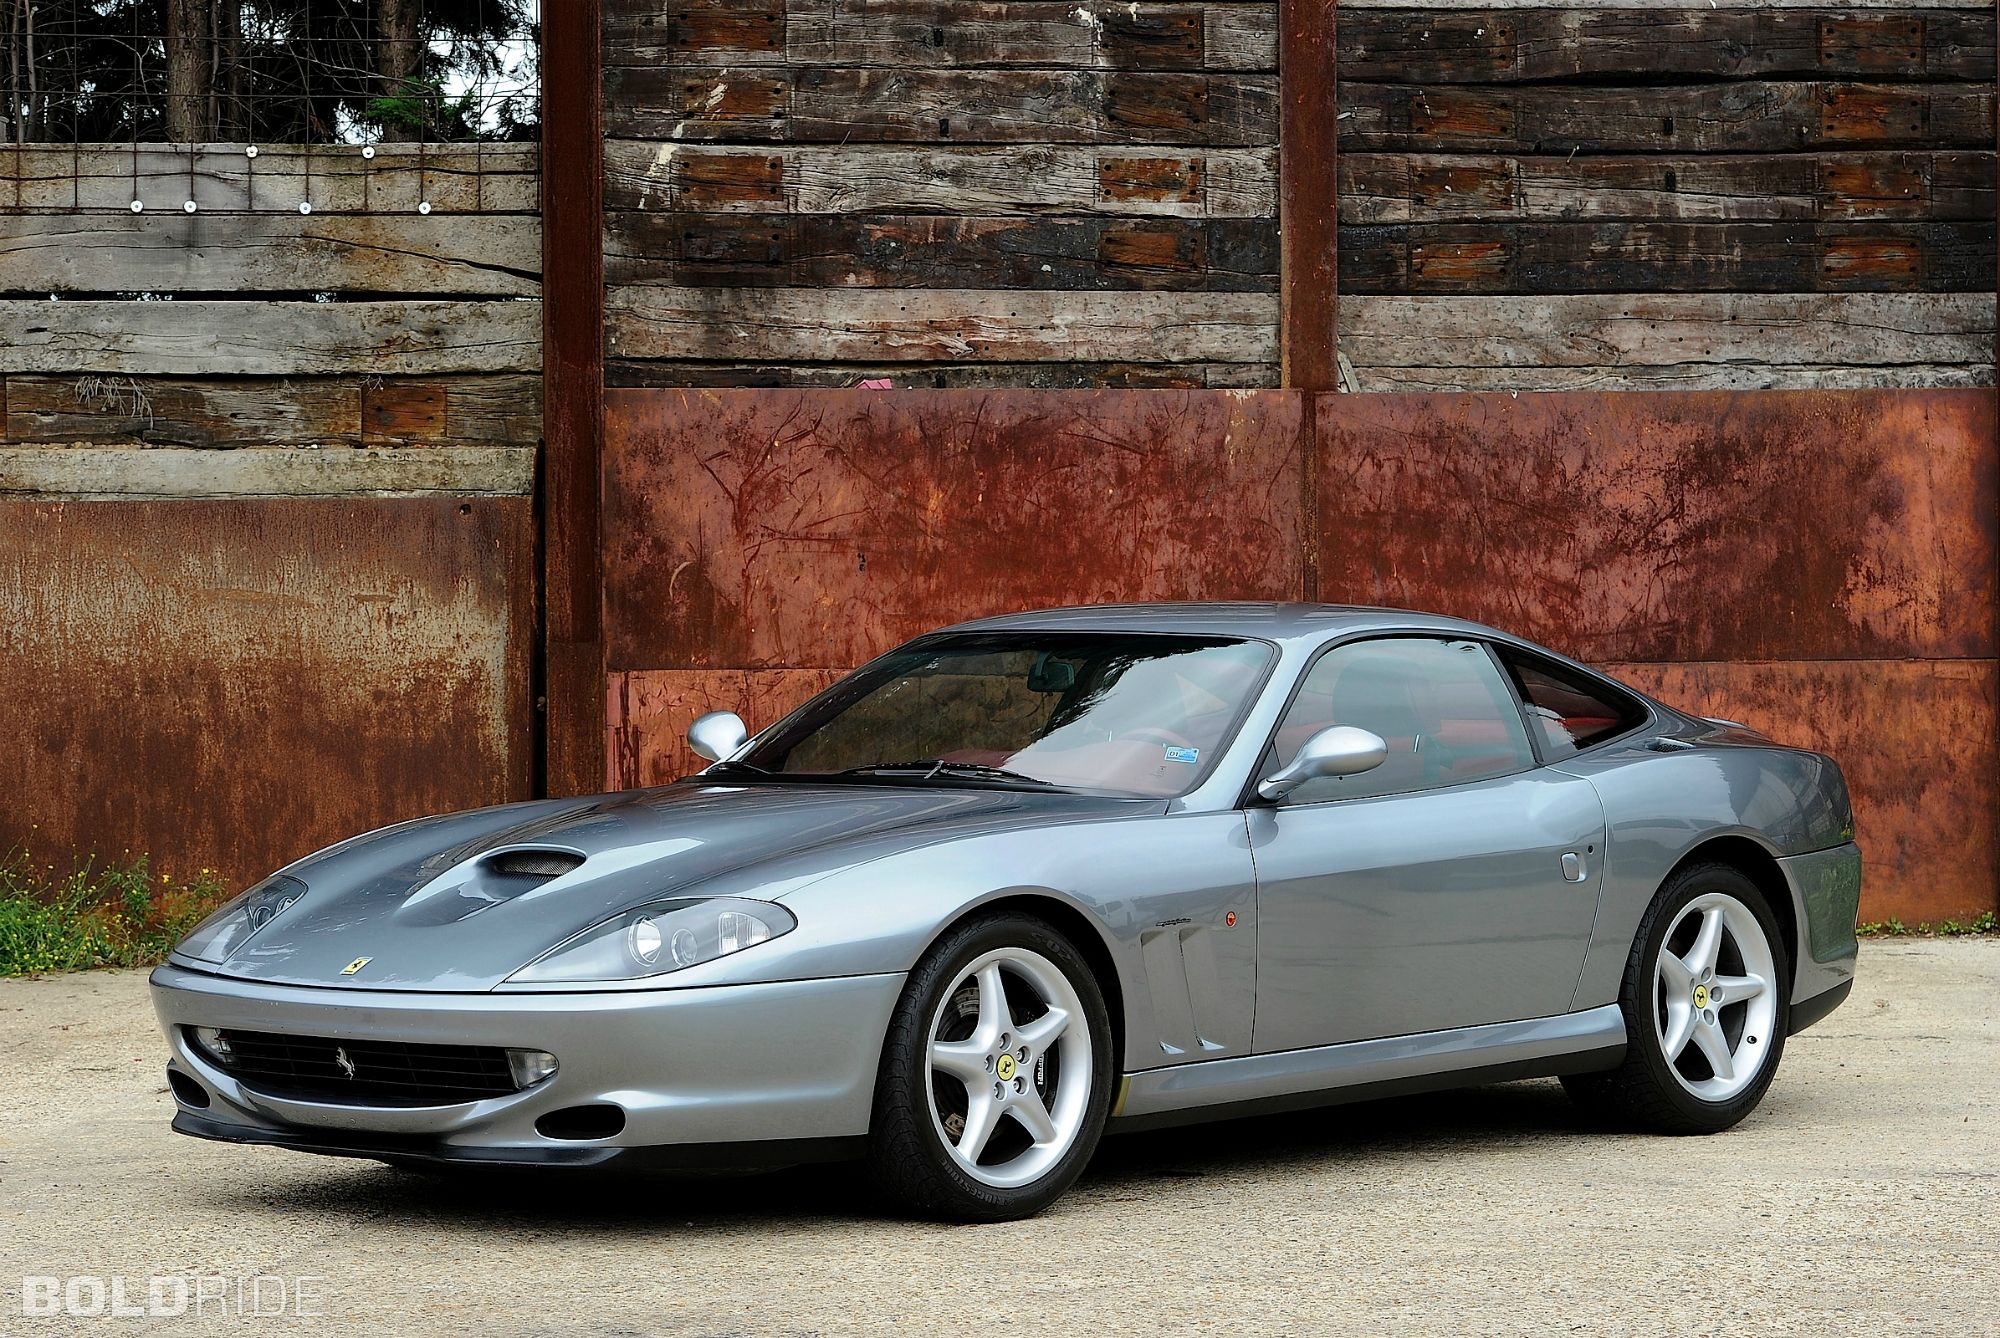 Beautiful ferrari 550 maranello from 1996 will smith drove one in bad boys ii